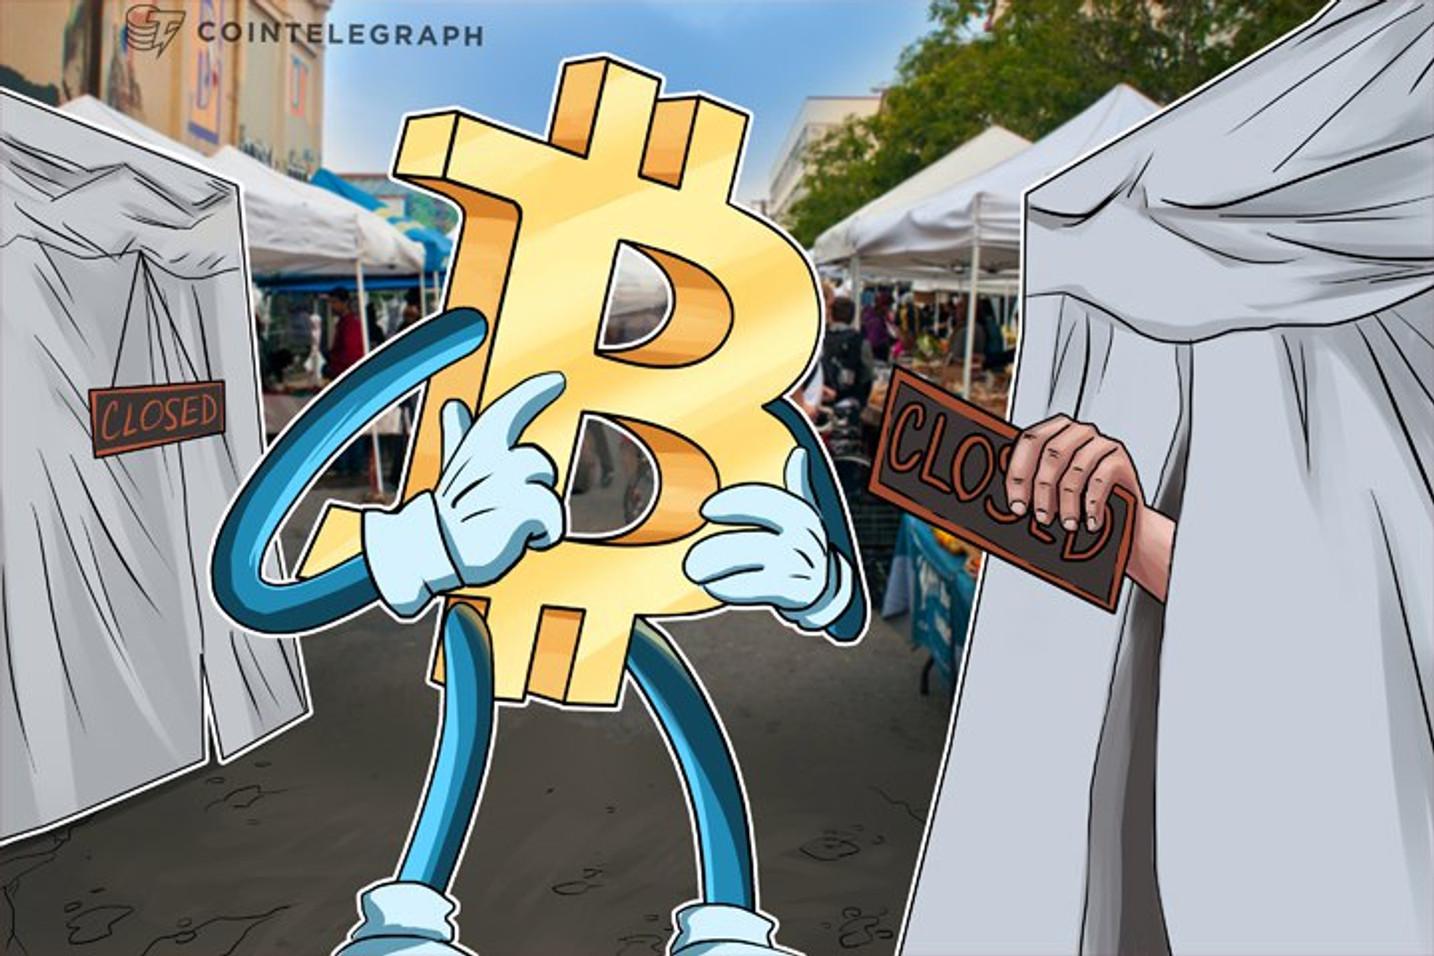 Retailers Turn Their Backs On Booming Bitcoin: Trade Magazine